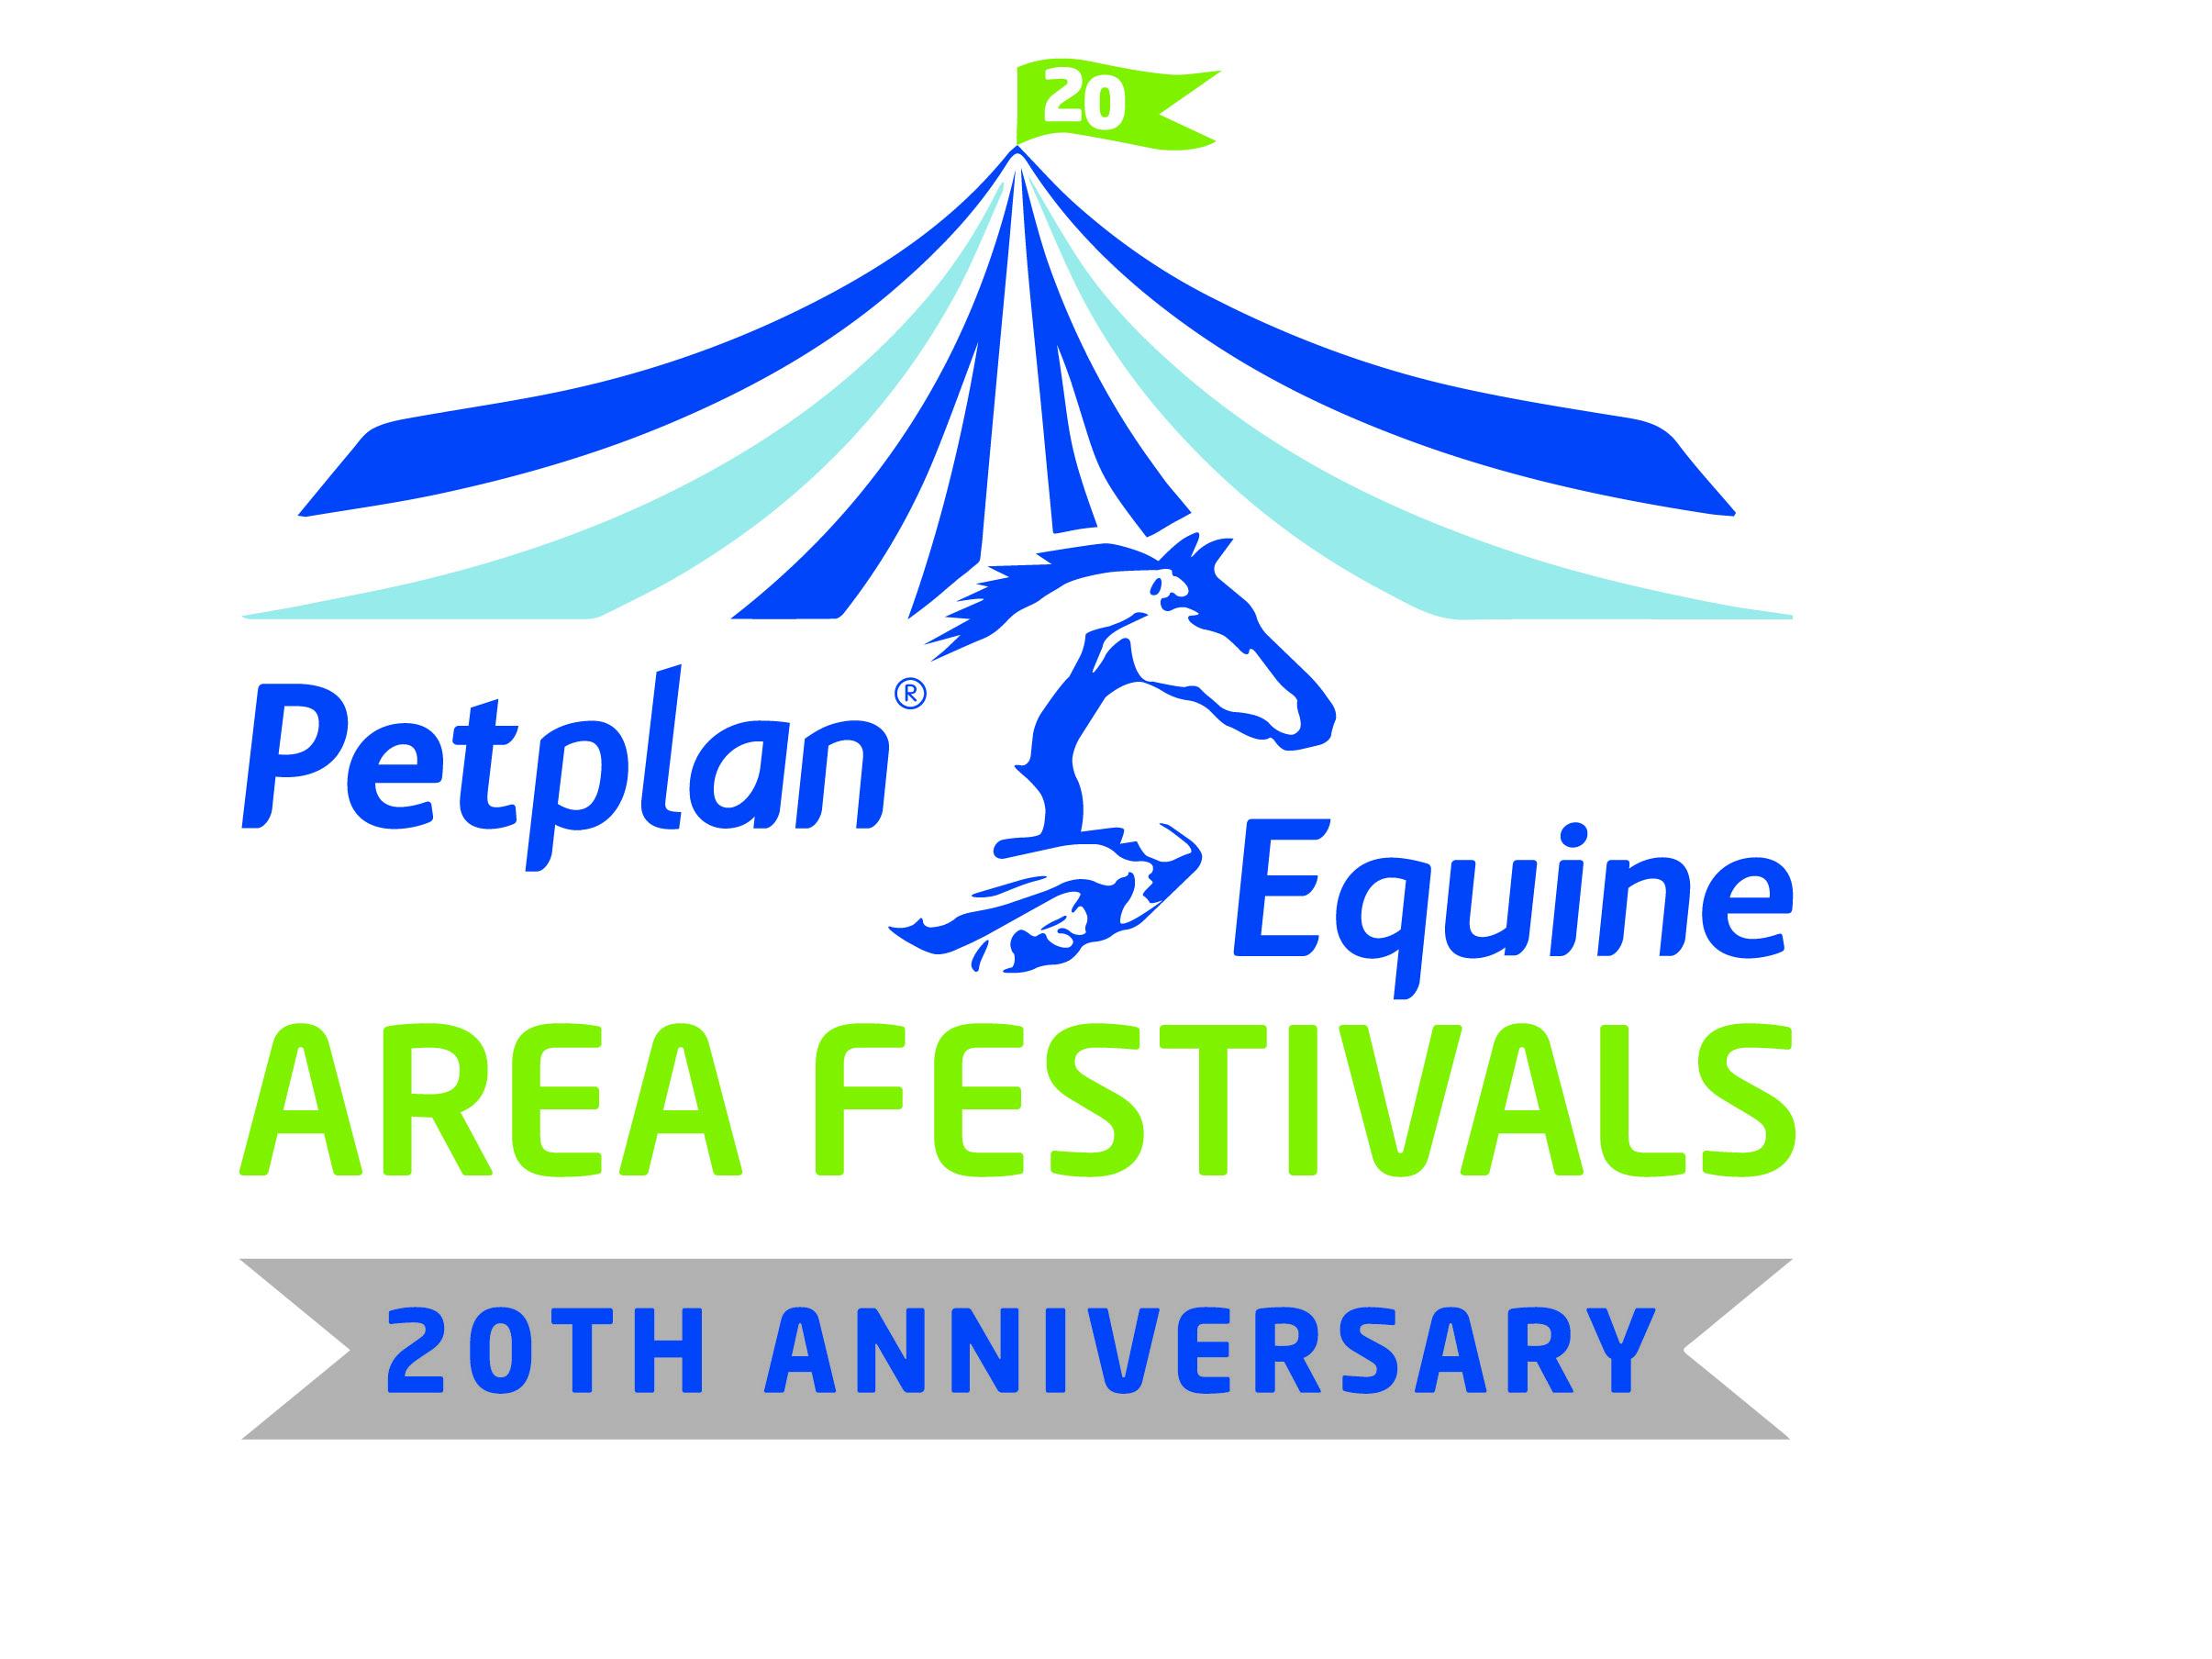 area_festivals_logo_PPE_20th_anniversary_final_colour.jpg